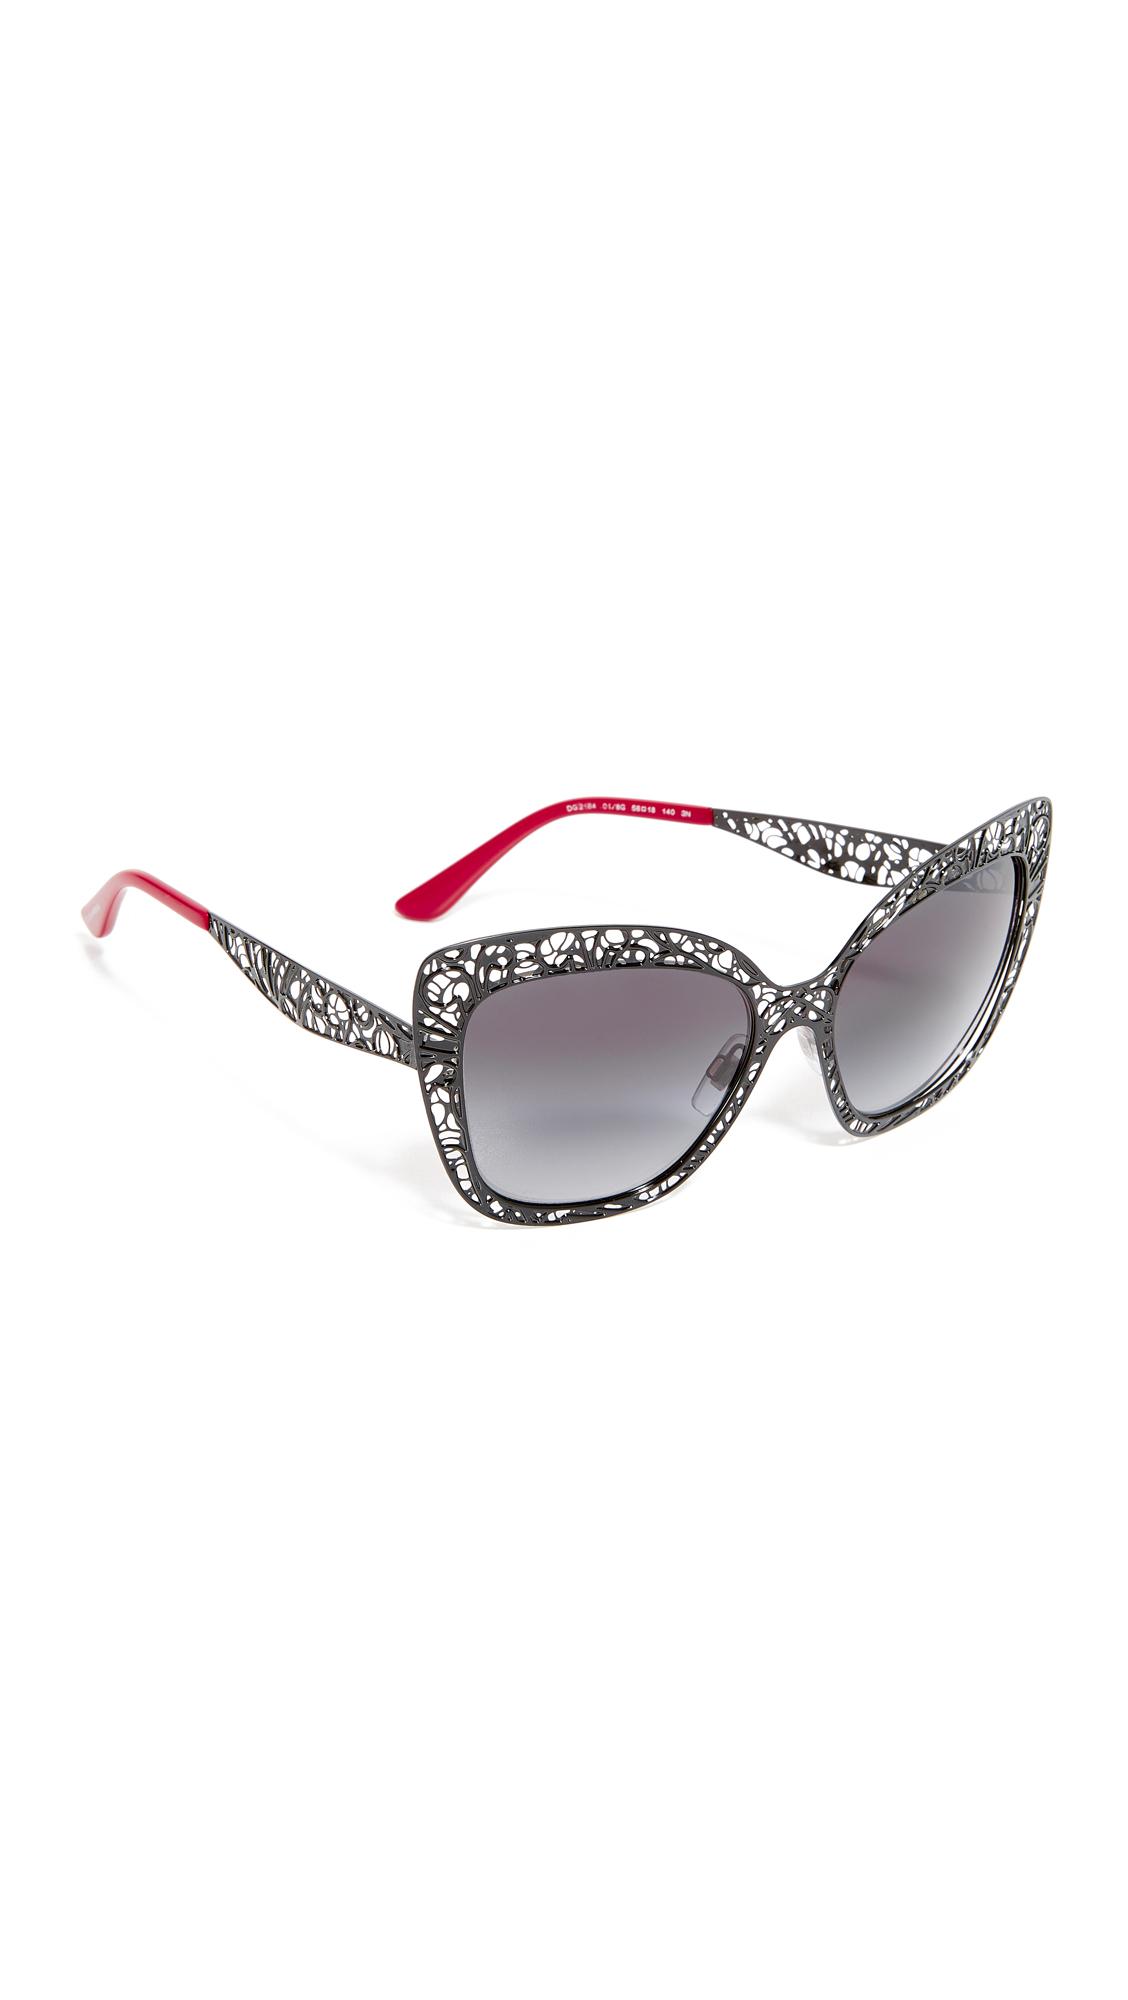 Dolce & Gabbana Lace Sunglasses - Black/Grey at Shopbop